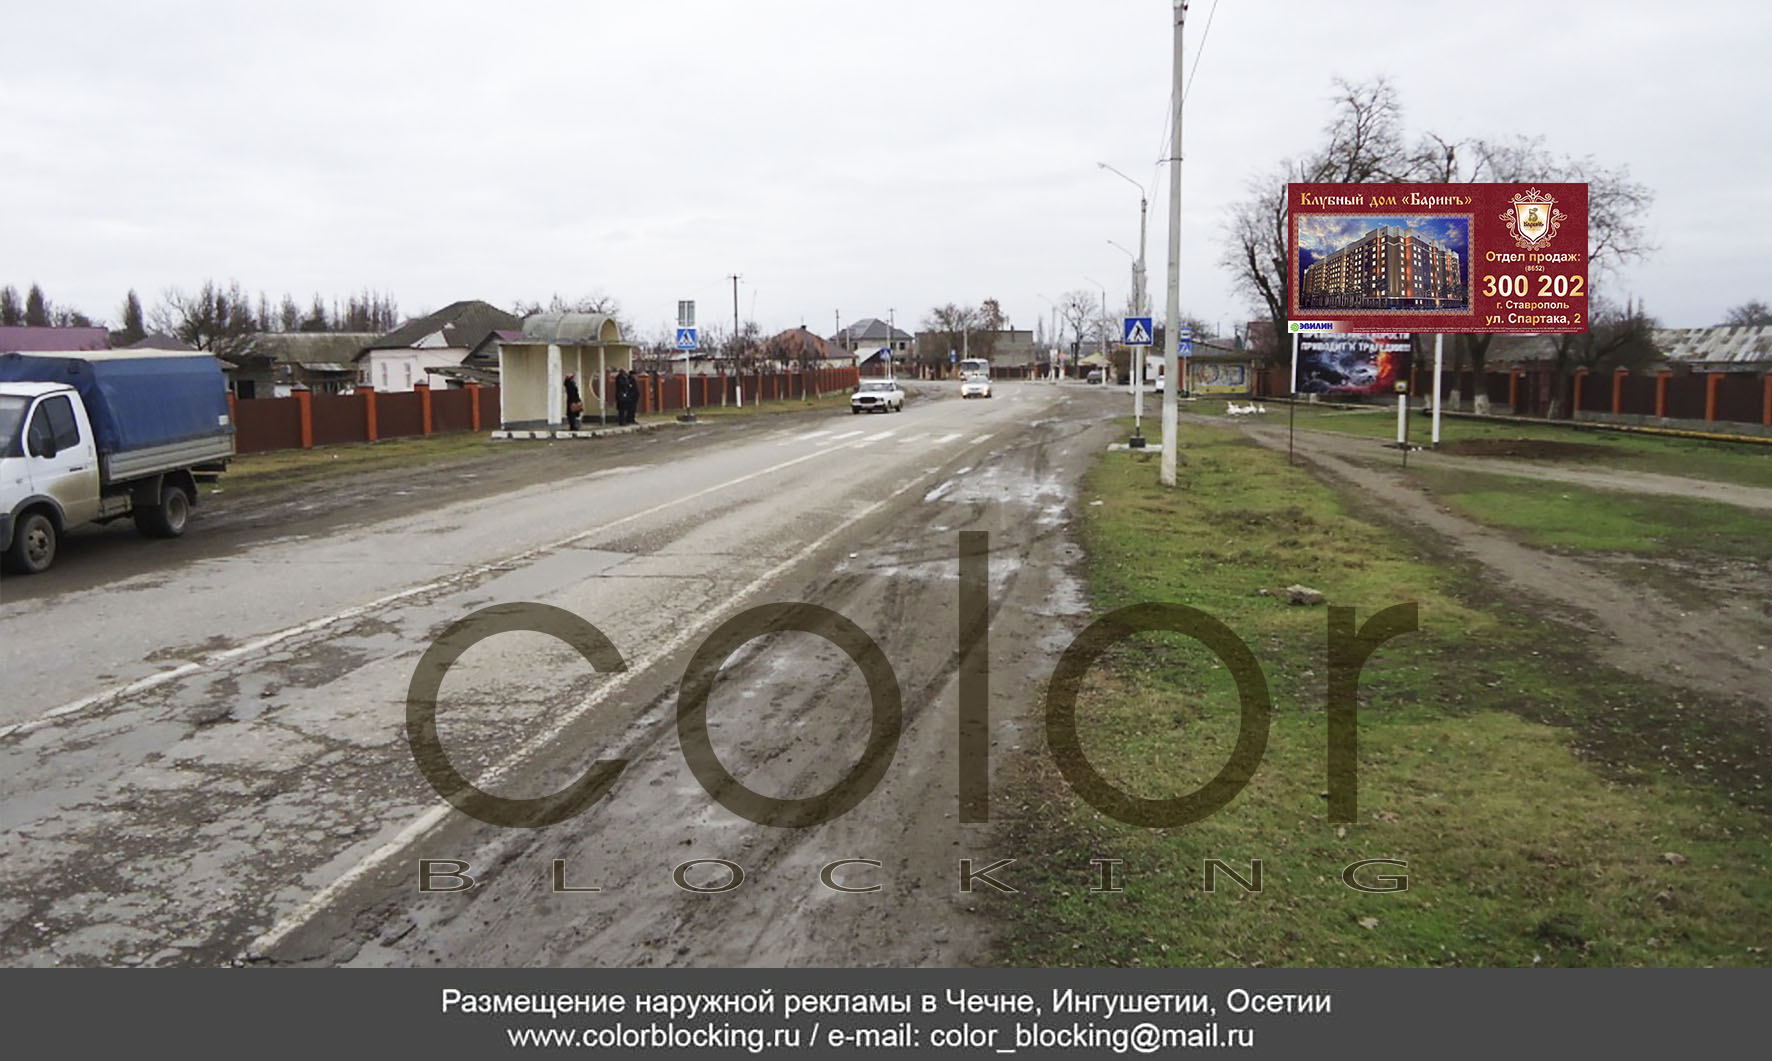 Наружная реклама в населенных пунктах Чечни Мекенская